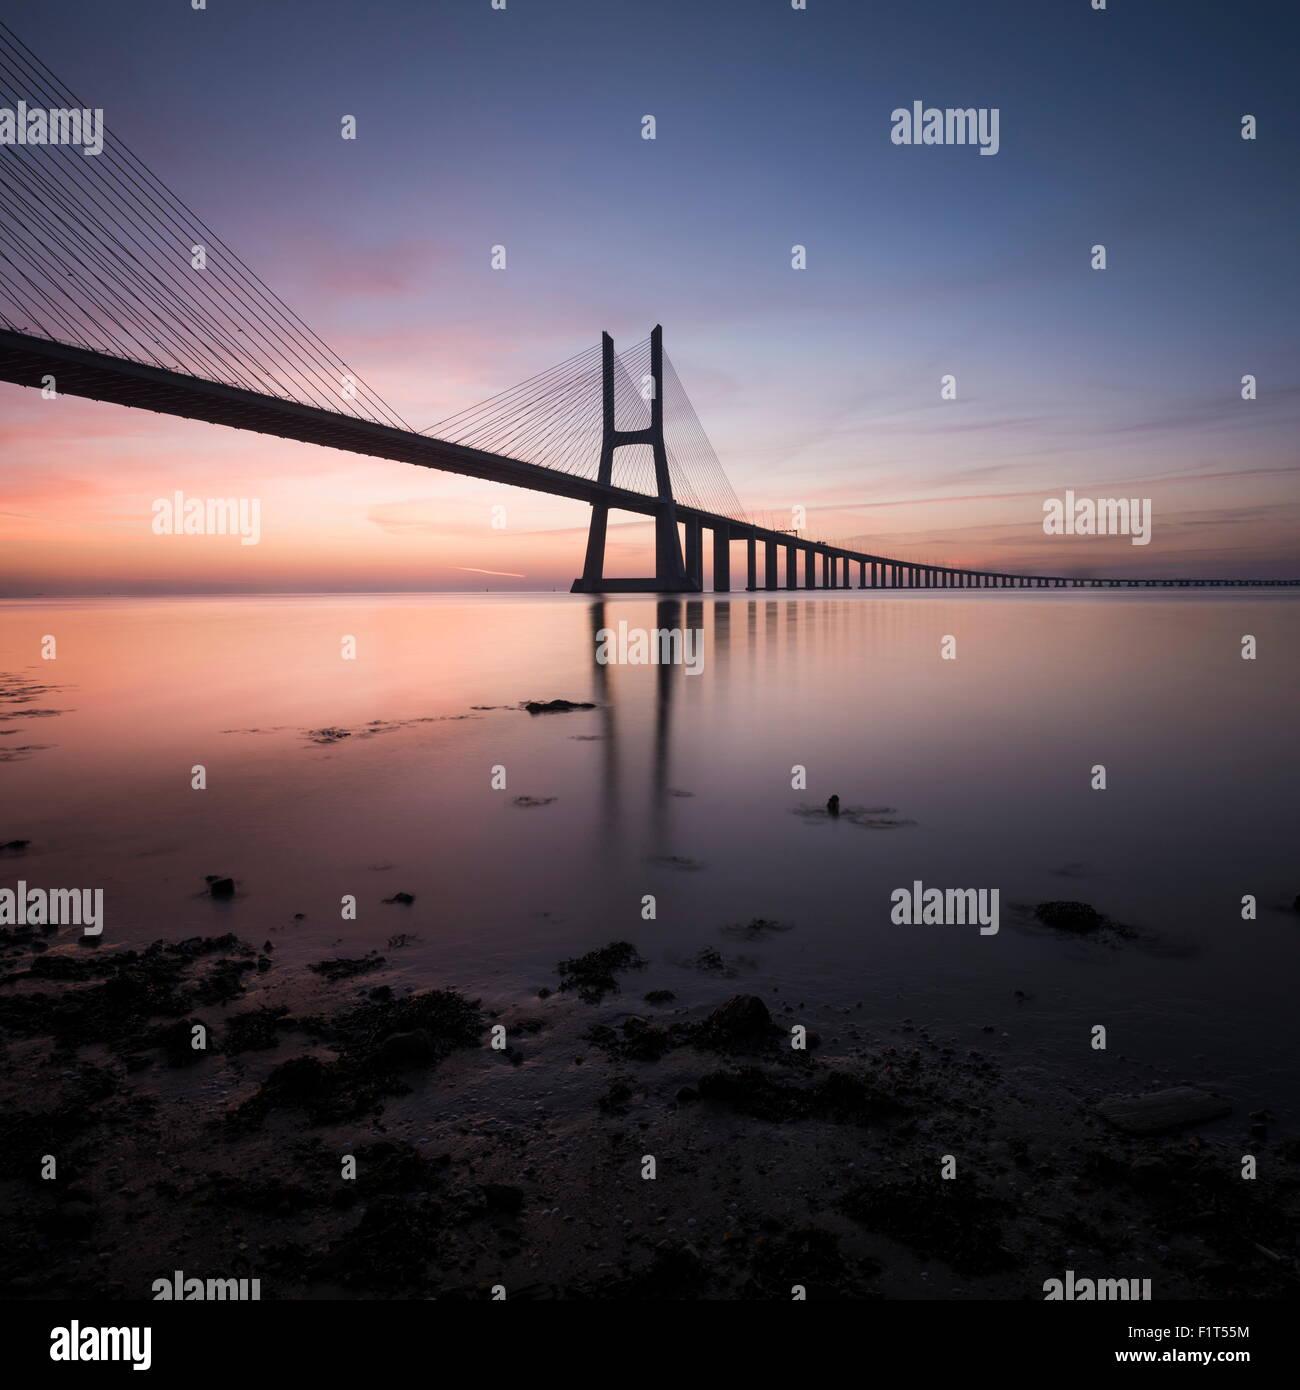 Vasco da Gama Bridge over Rio Tejo (Tagus River) at dawn, Lisbon, Portugal, Europe - Stock Image